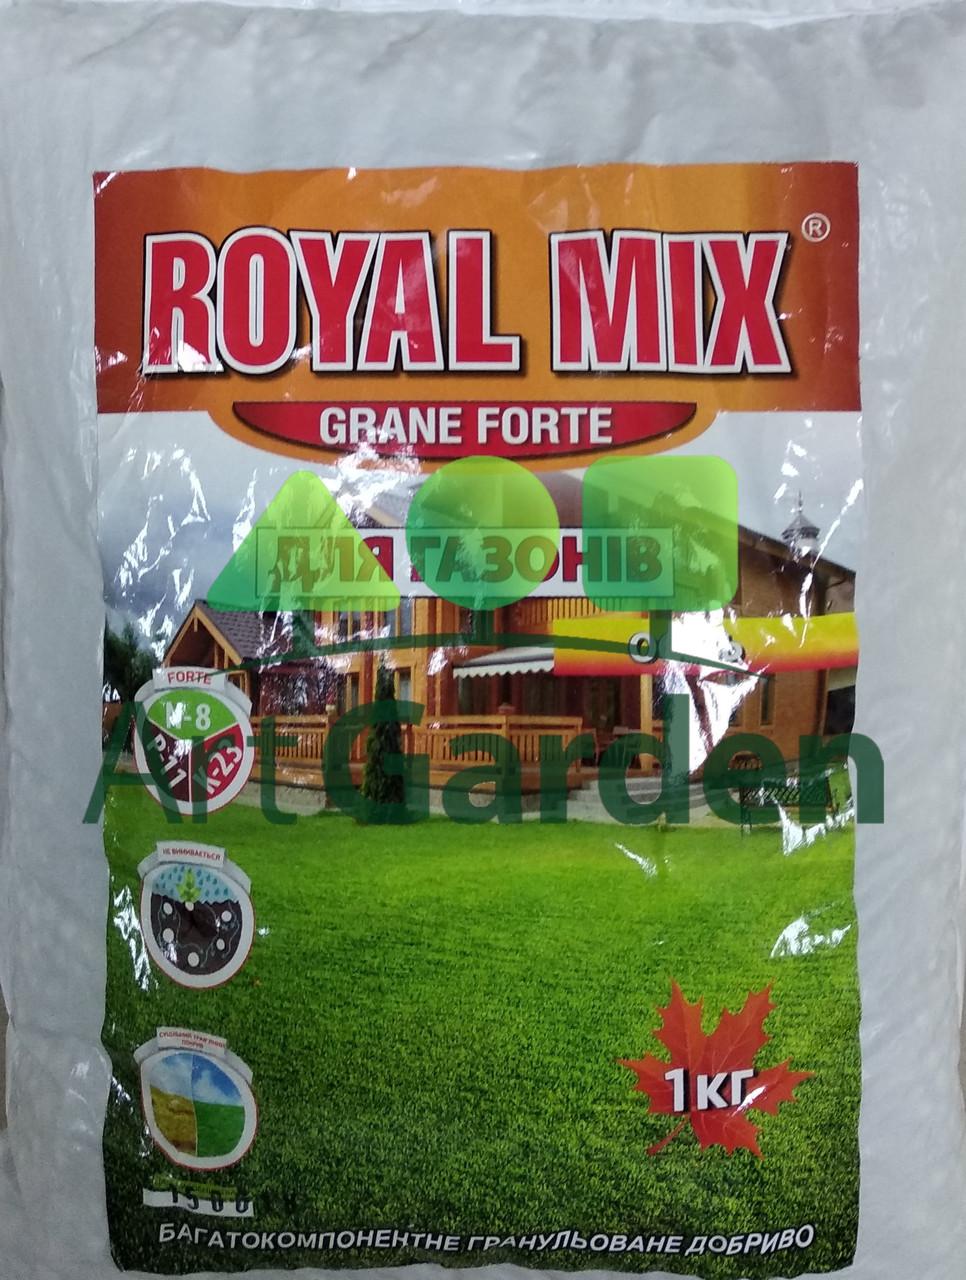 ROYAL MIX GRANE FORTE осеннее для газона 1кг